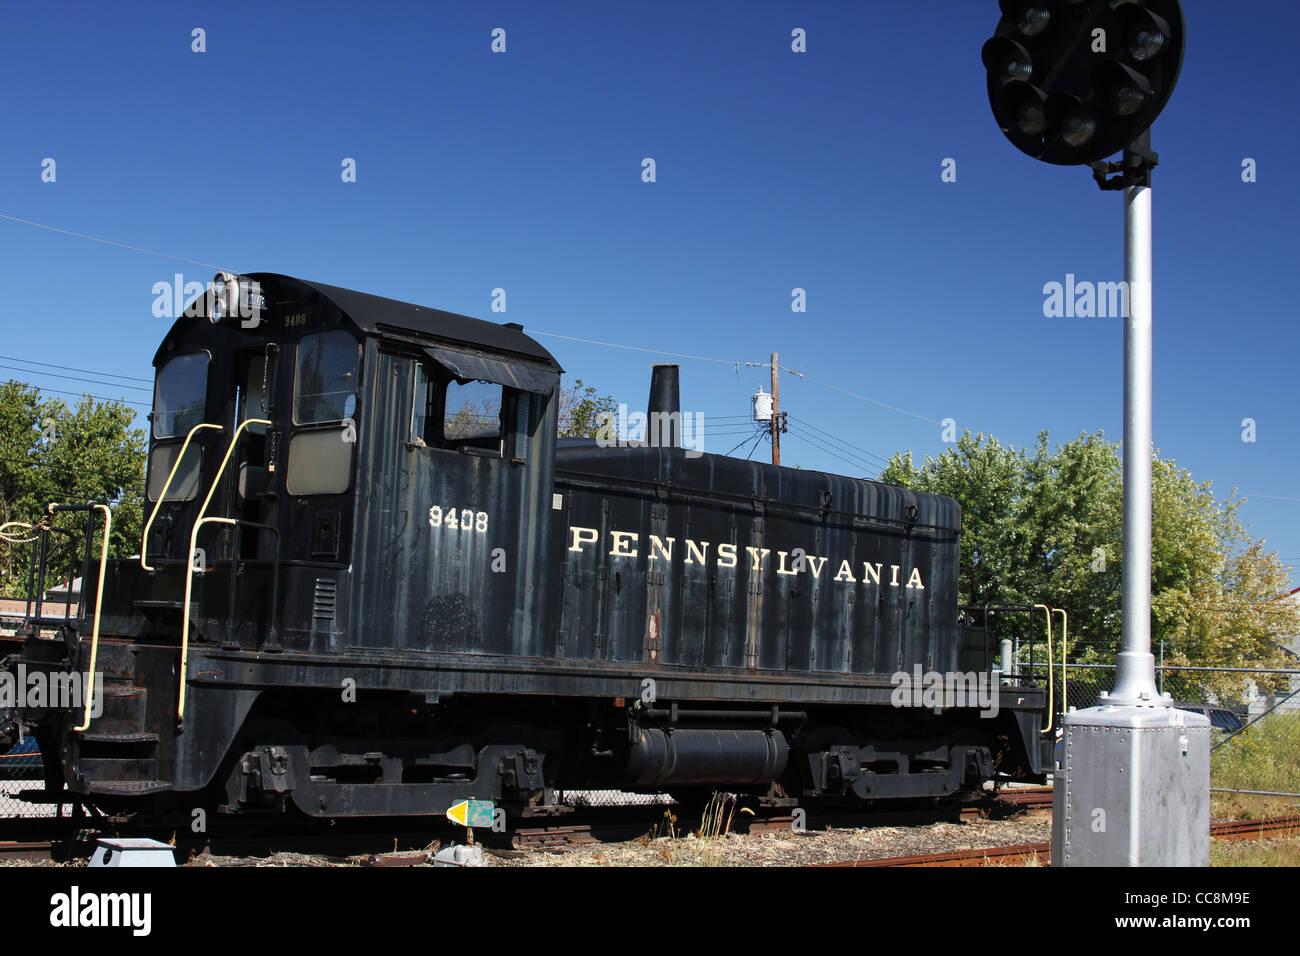 Pennsylvania Railroad 9408 locomotive. - Stock Image